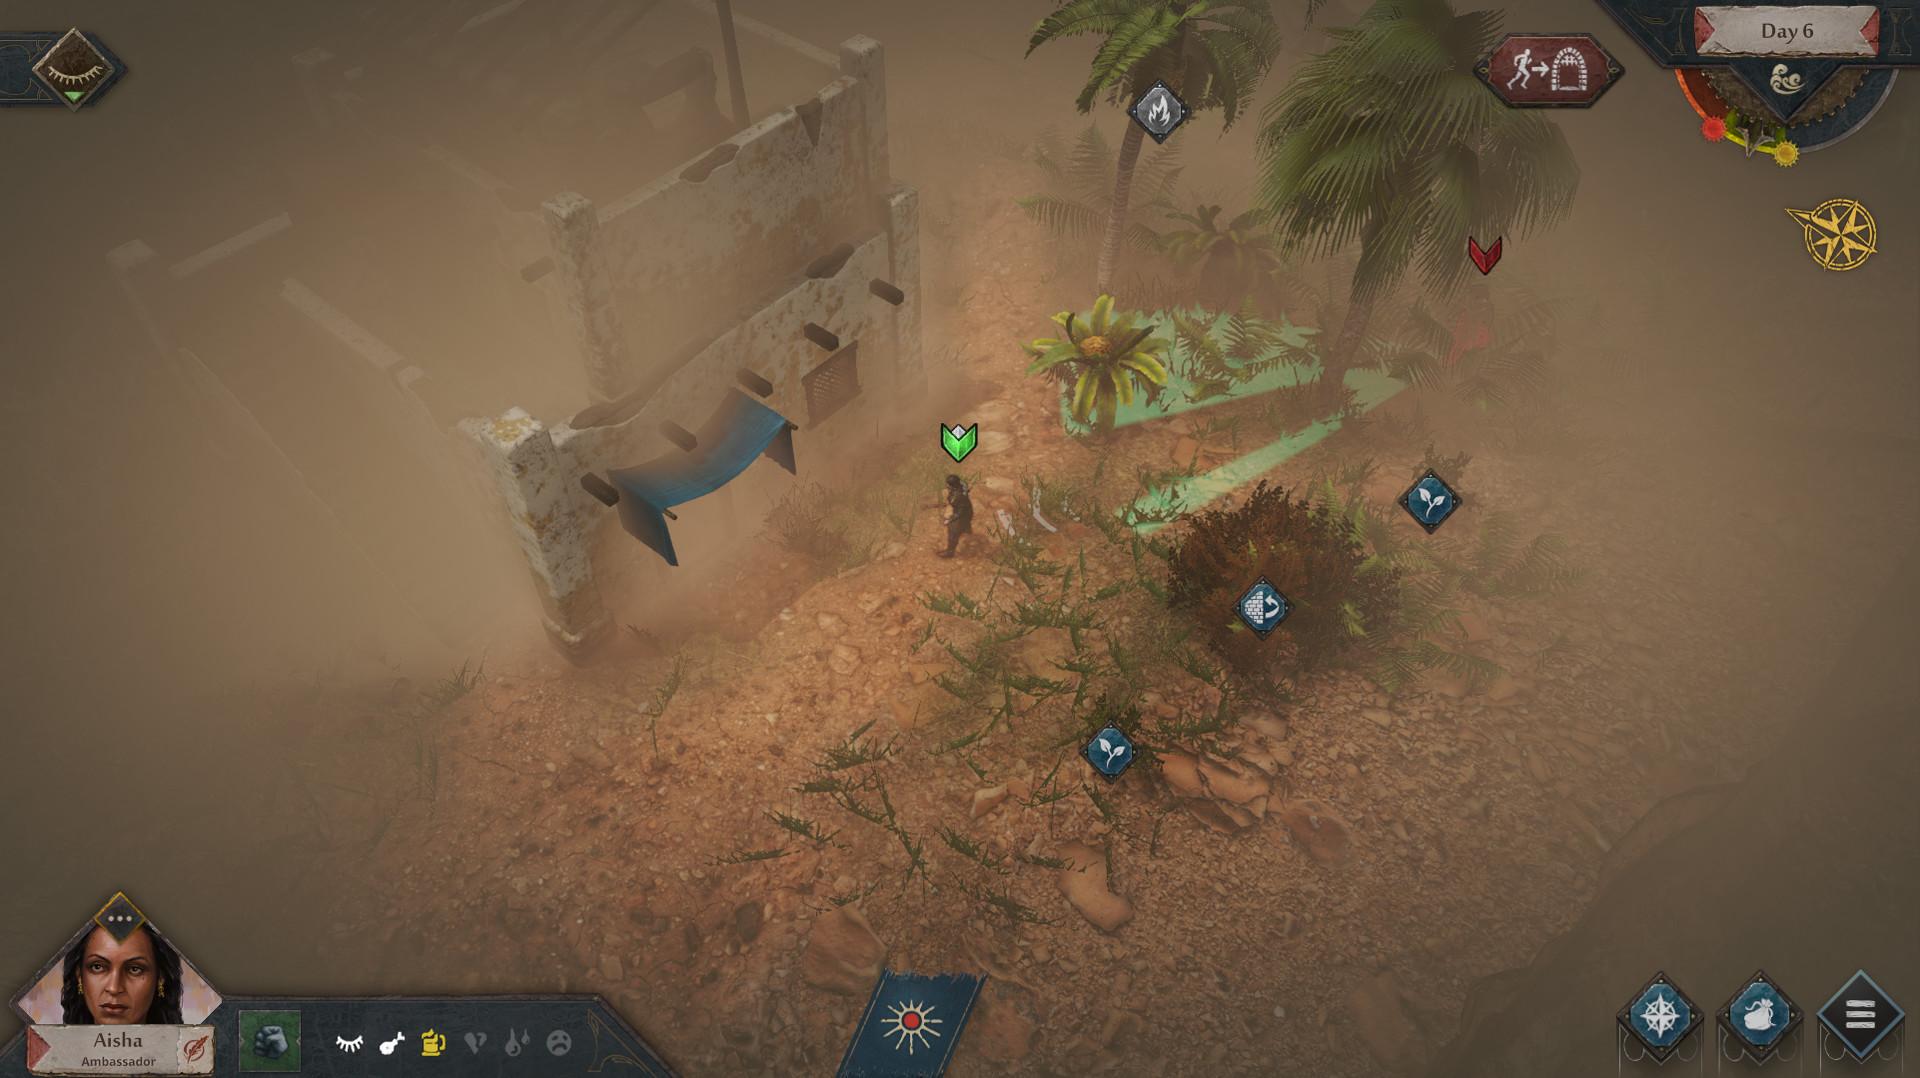 siege-survival-gloria-victis-pc-screenshot-2